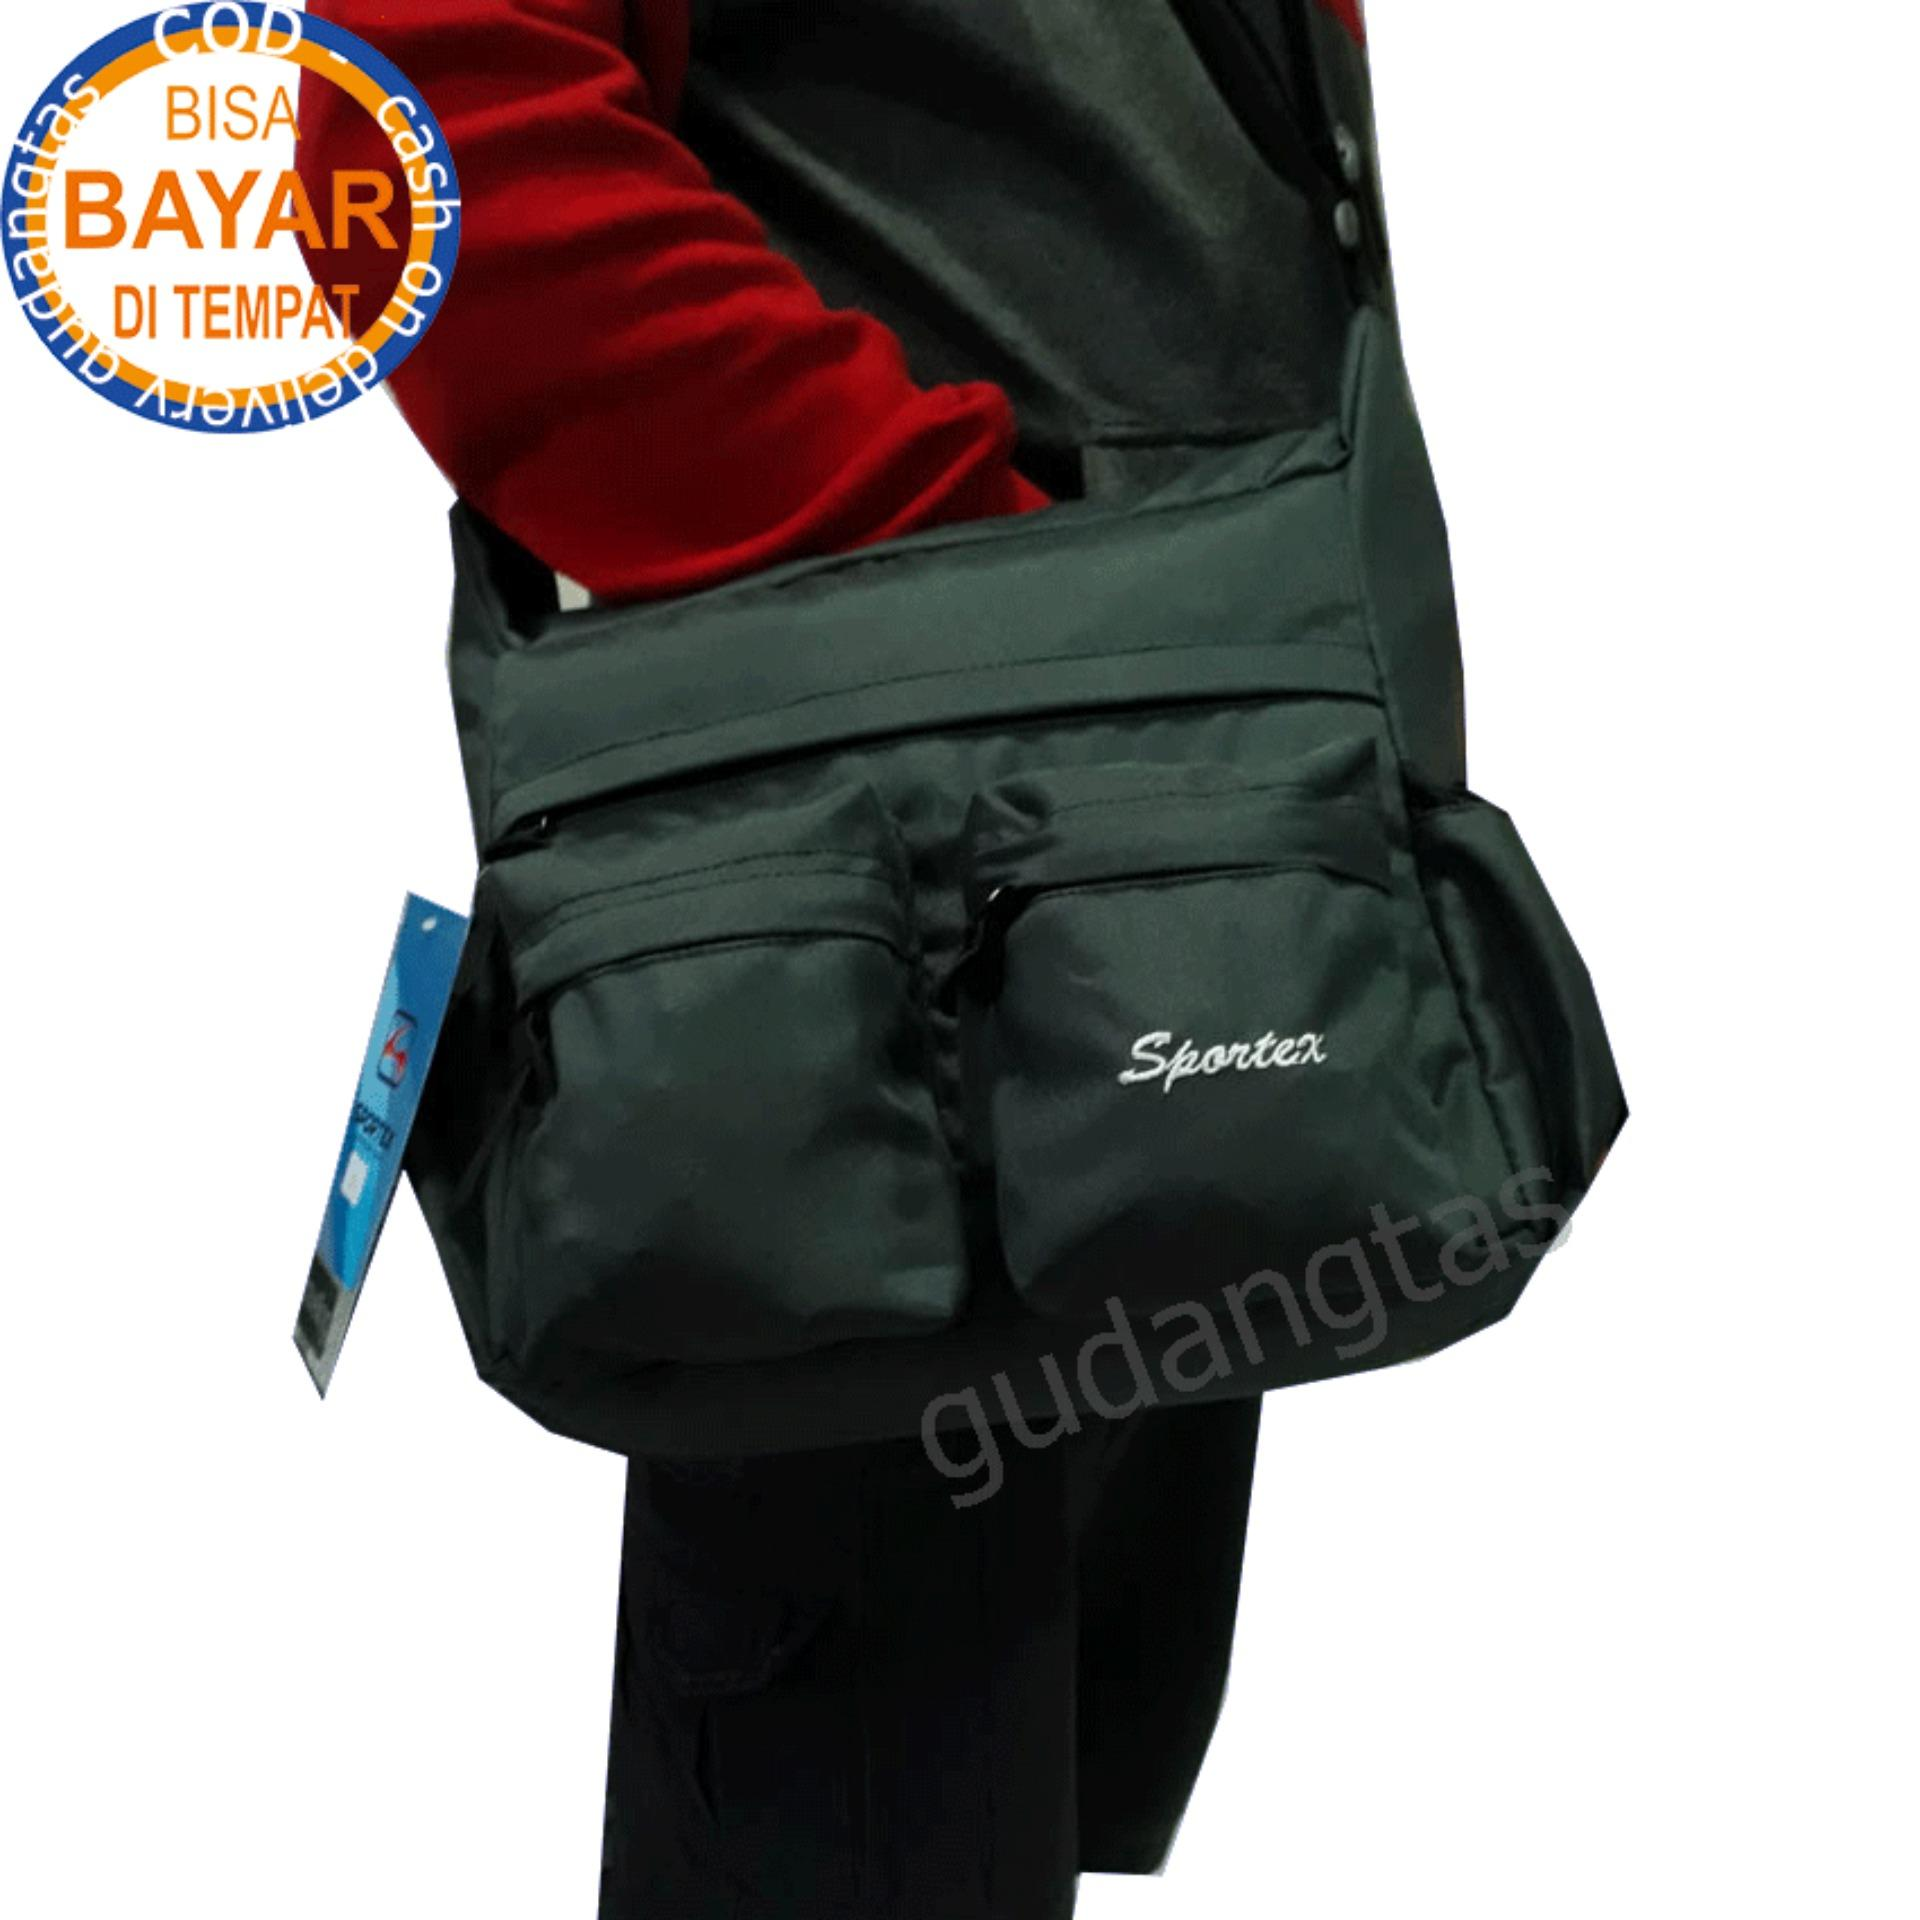 Kelebihan Diskon Tas Selempang Model Xiaomi Shoulder Crossbody Bag Ransel Original Sportex Pria Sports Waist Tote Cordura Gdt0885 Abu